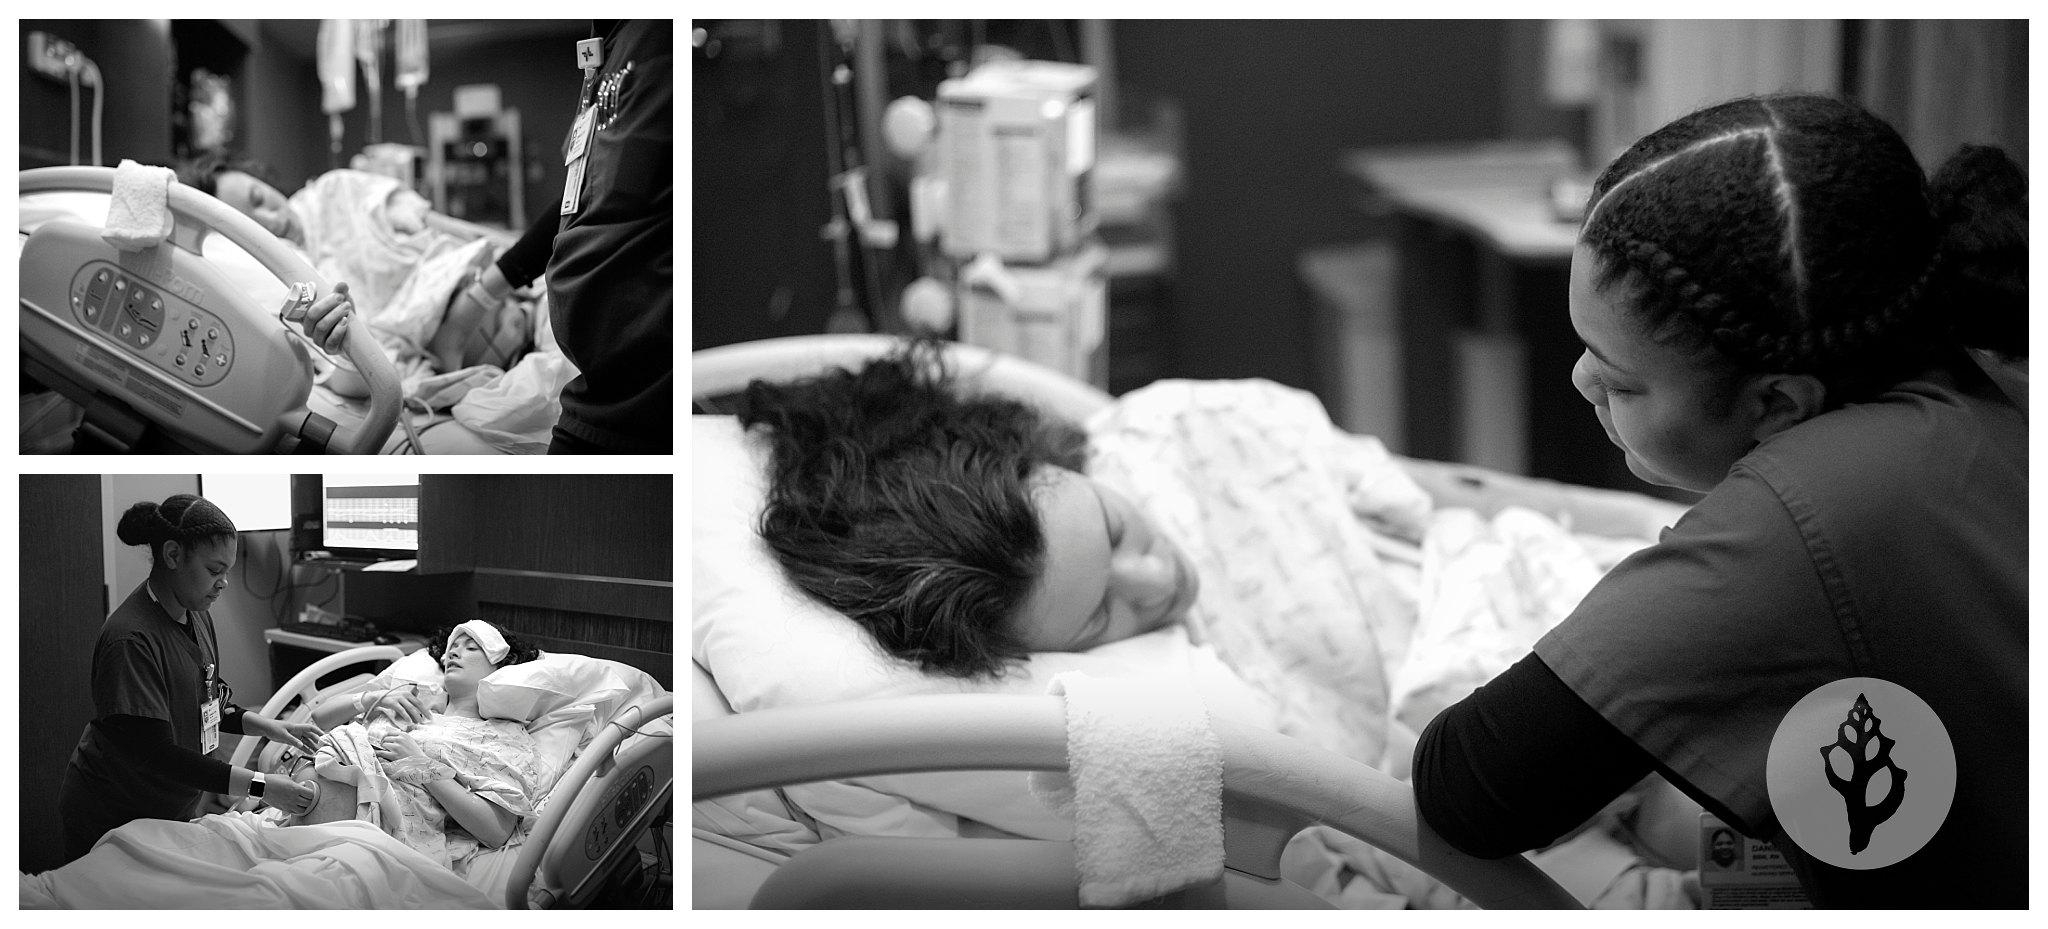 Keller-Southlake Texas Maternity Portraits and Birth Photography